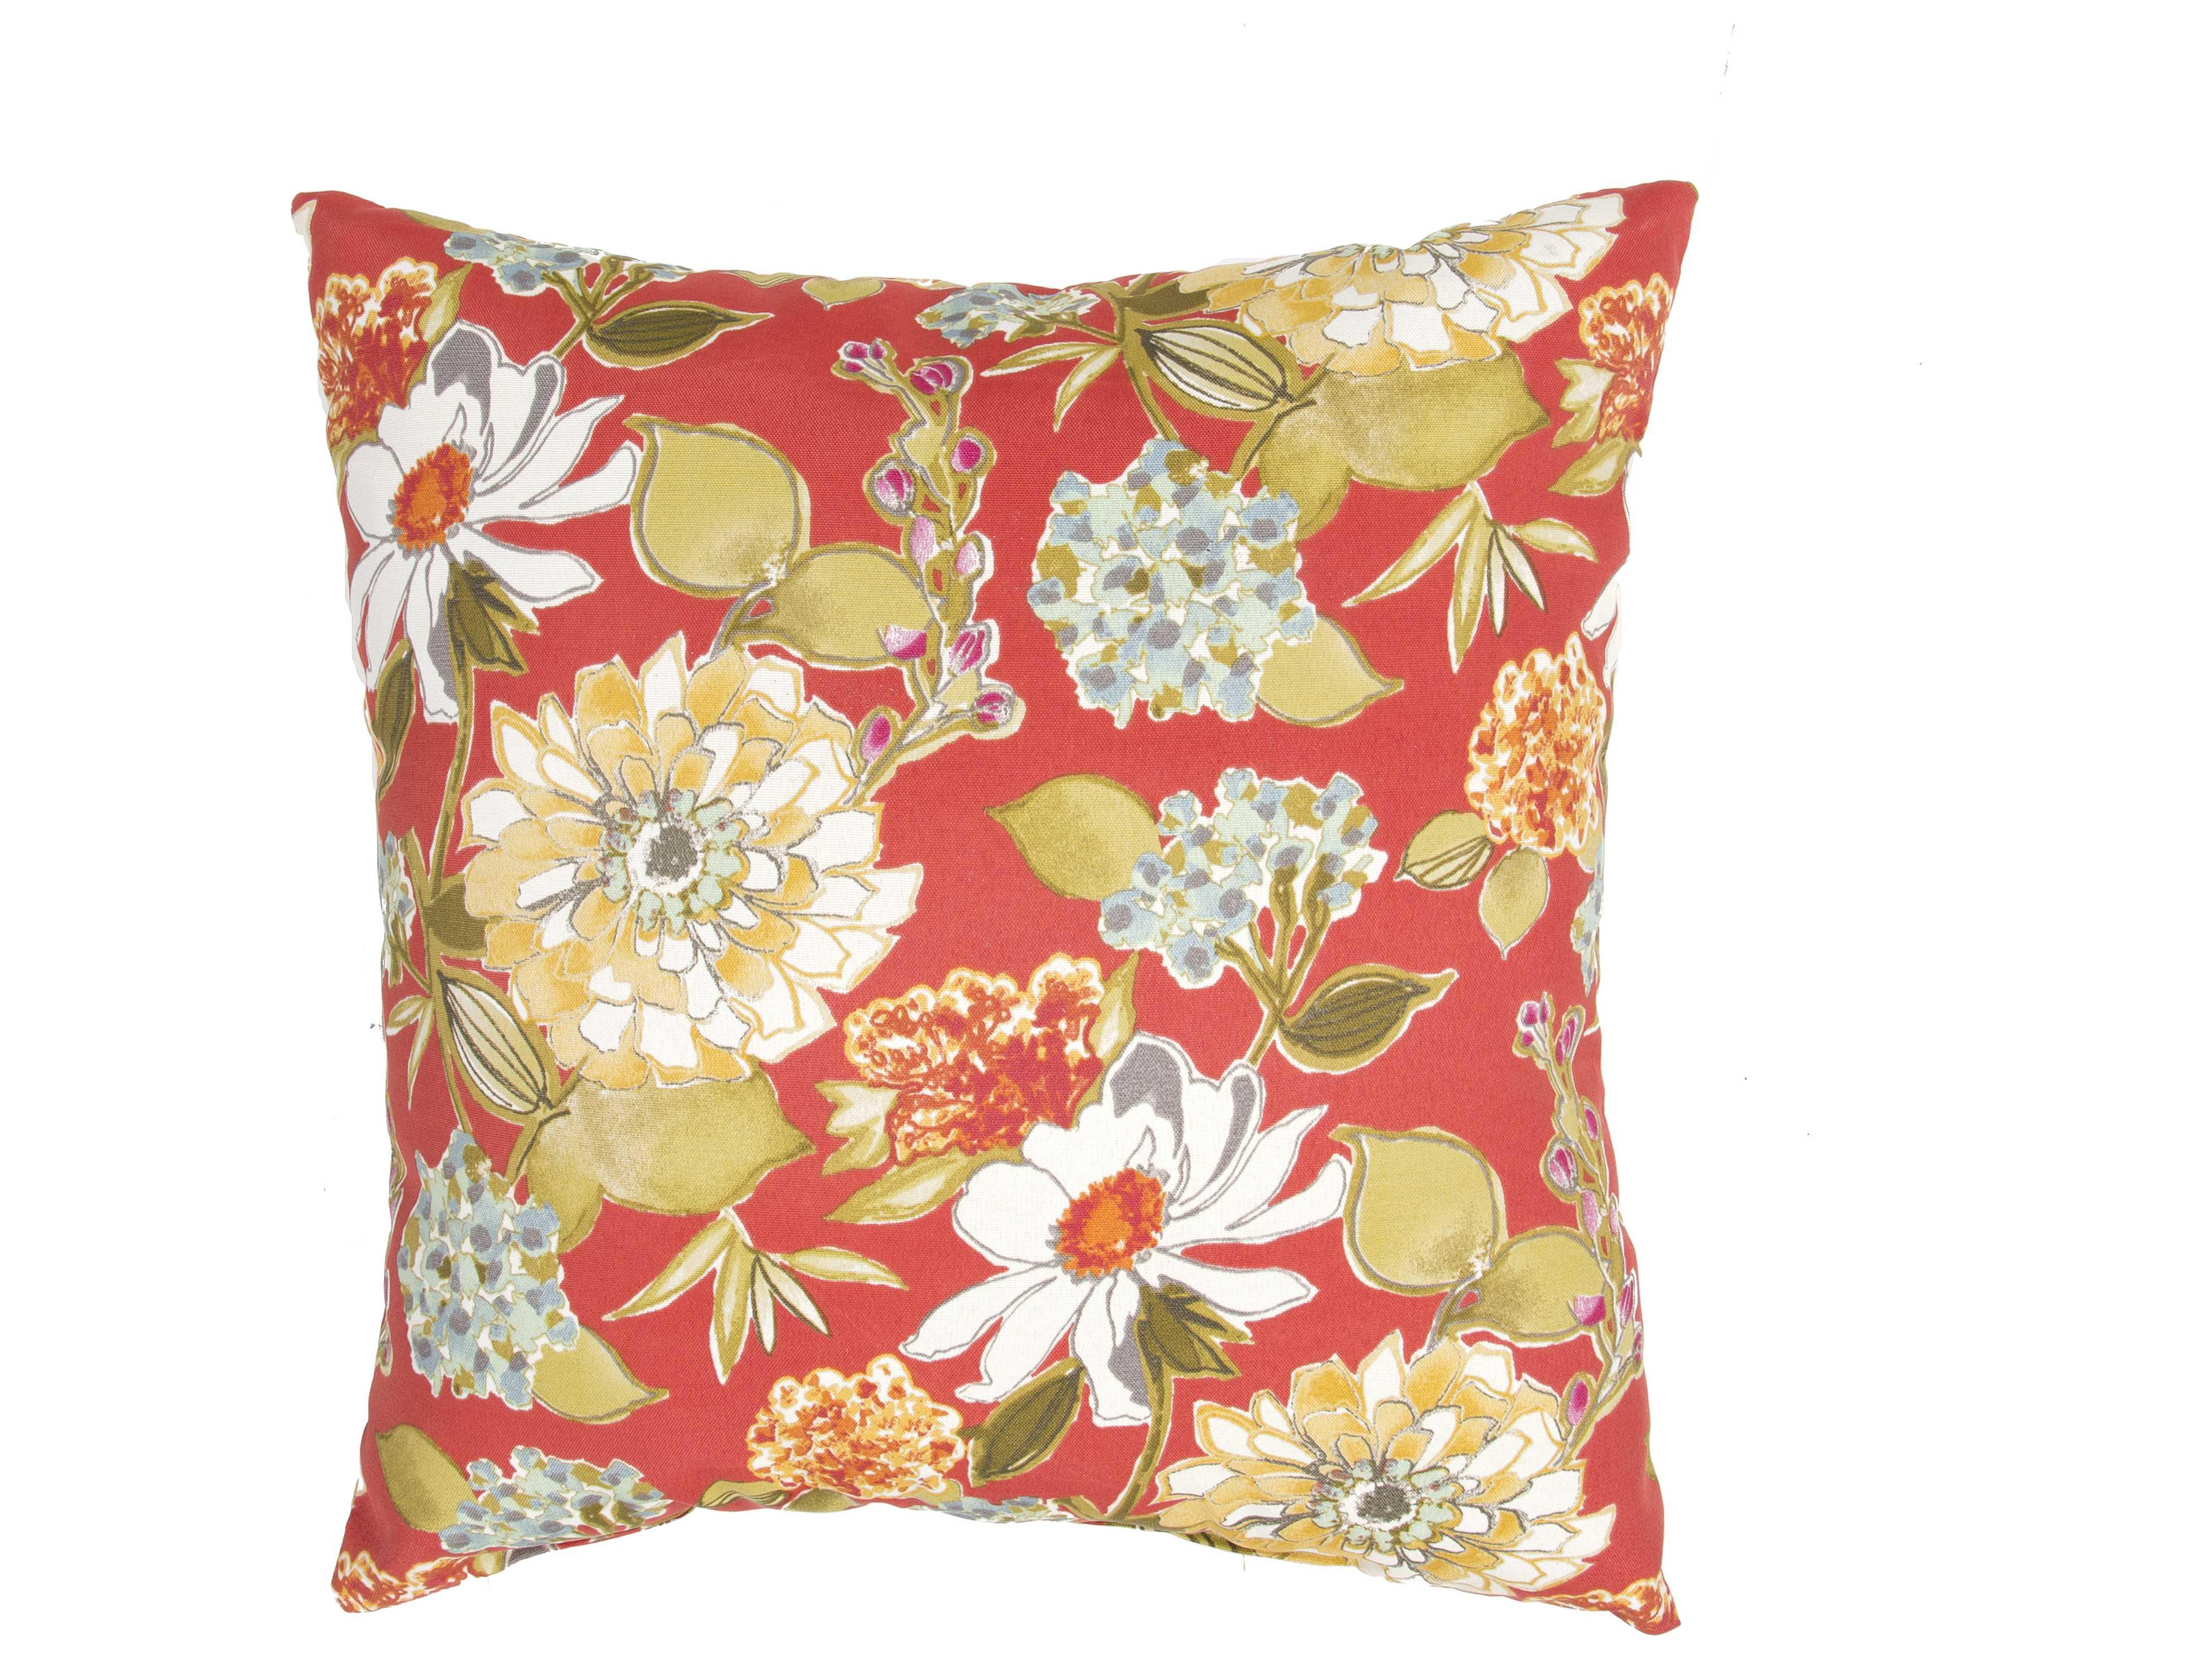 Jeep Throw Pillows : Jaipur Rugs Veranda Red Clay Square Pillow JPVER53